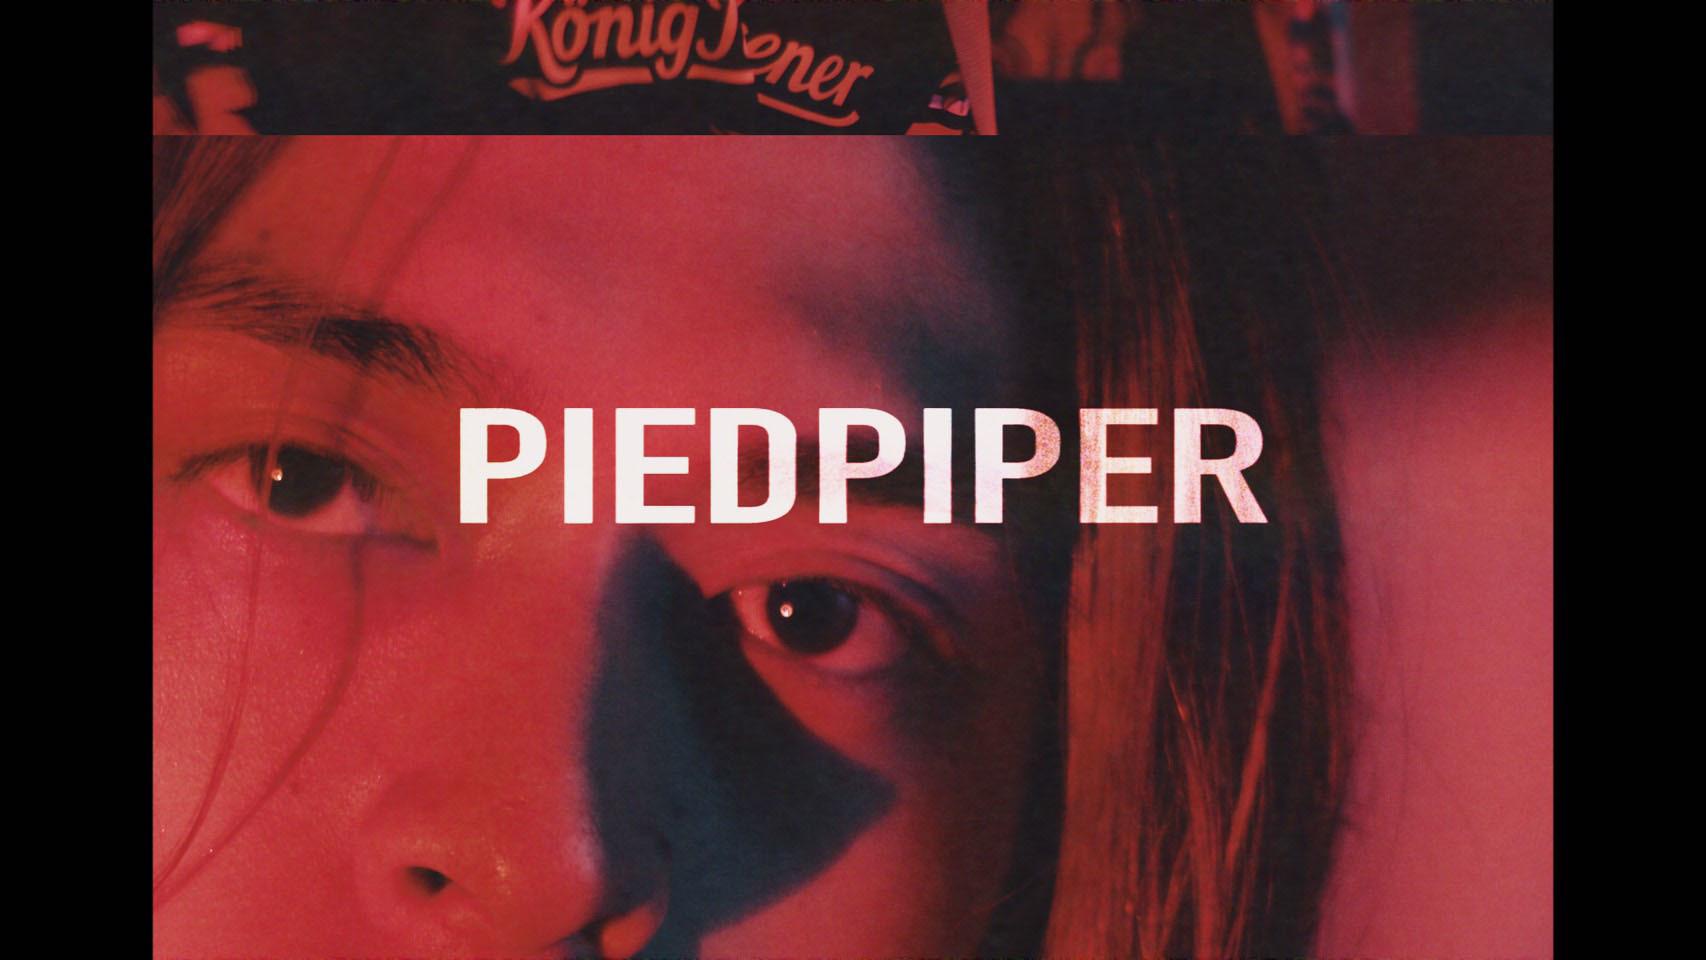 「PIEDPIPER」MVサムネイル